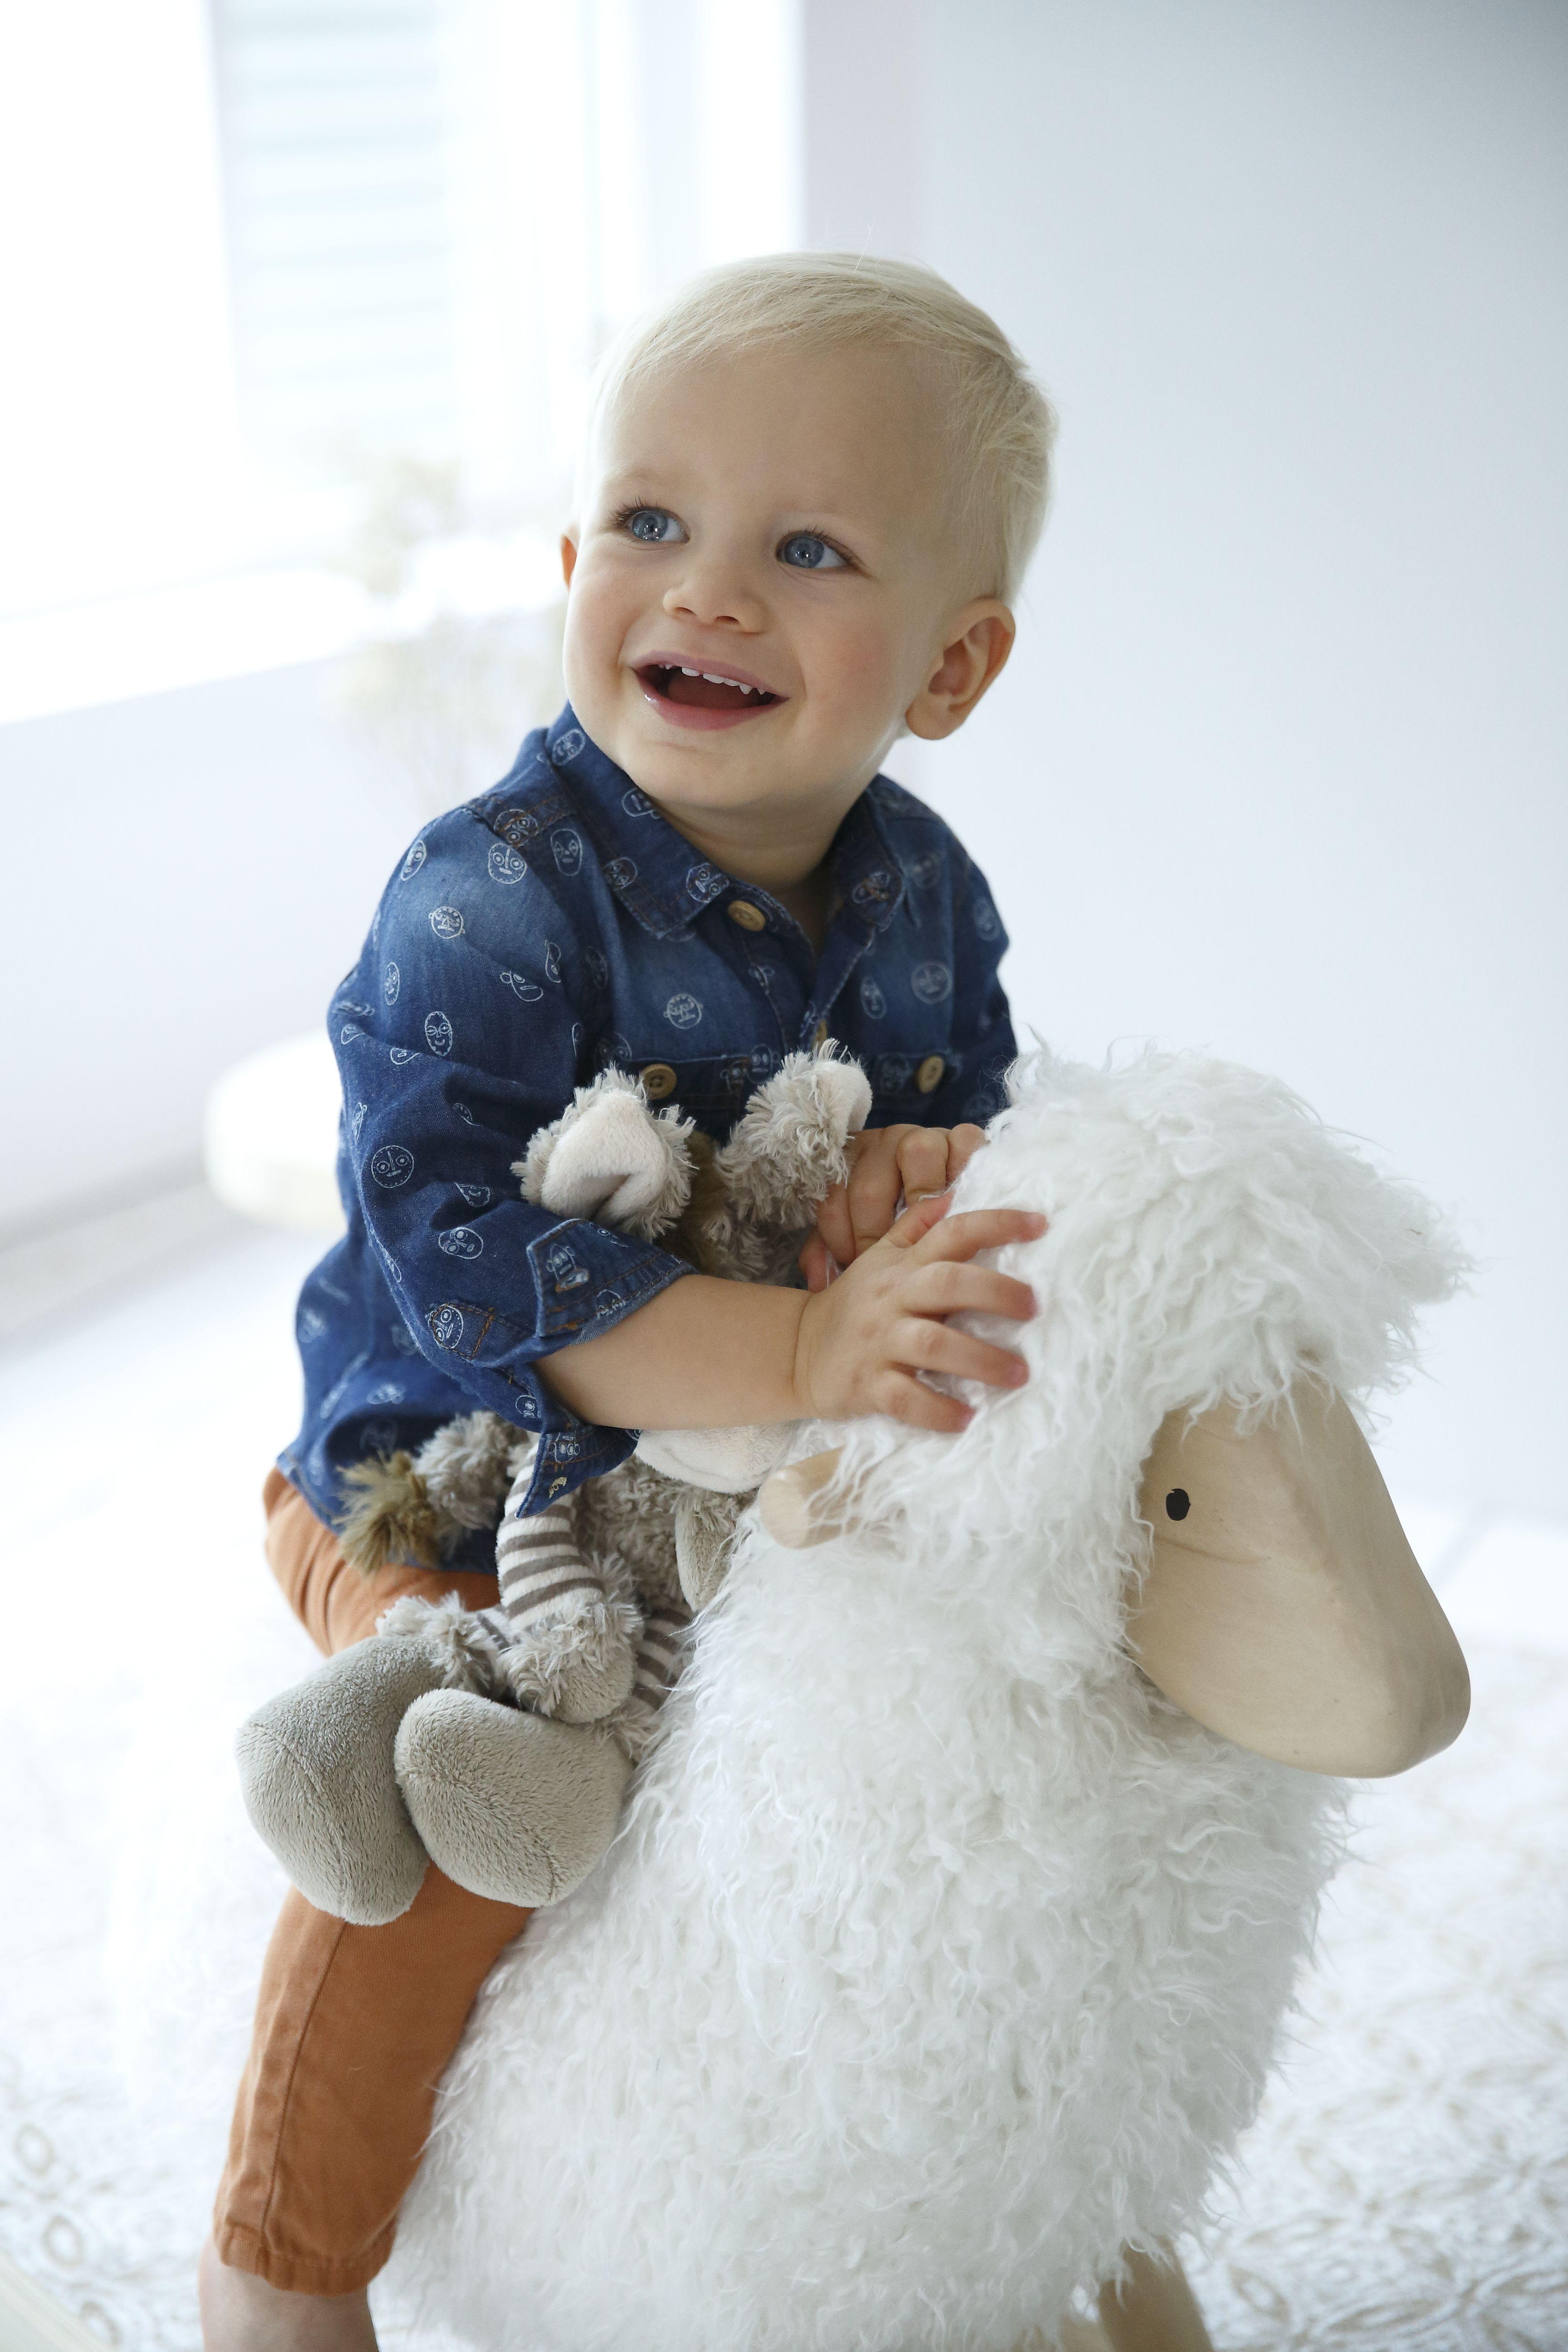 mouton a bascule mouton a bascule bascule jouet bebe